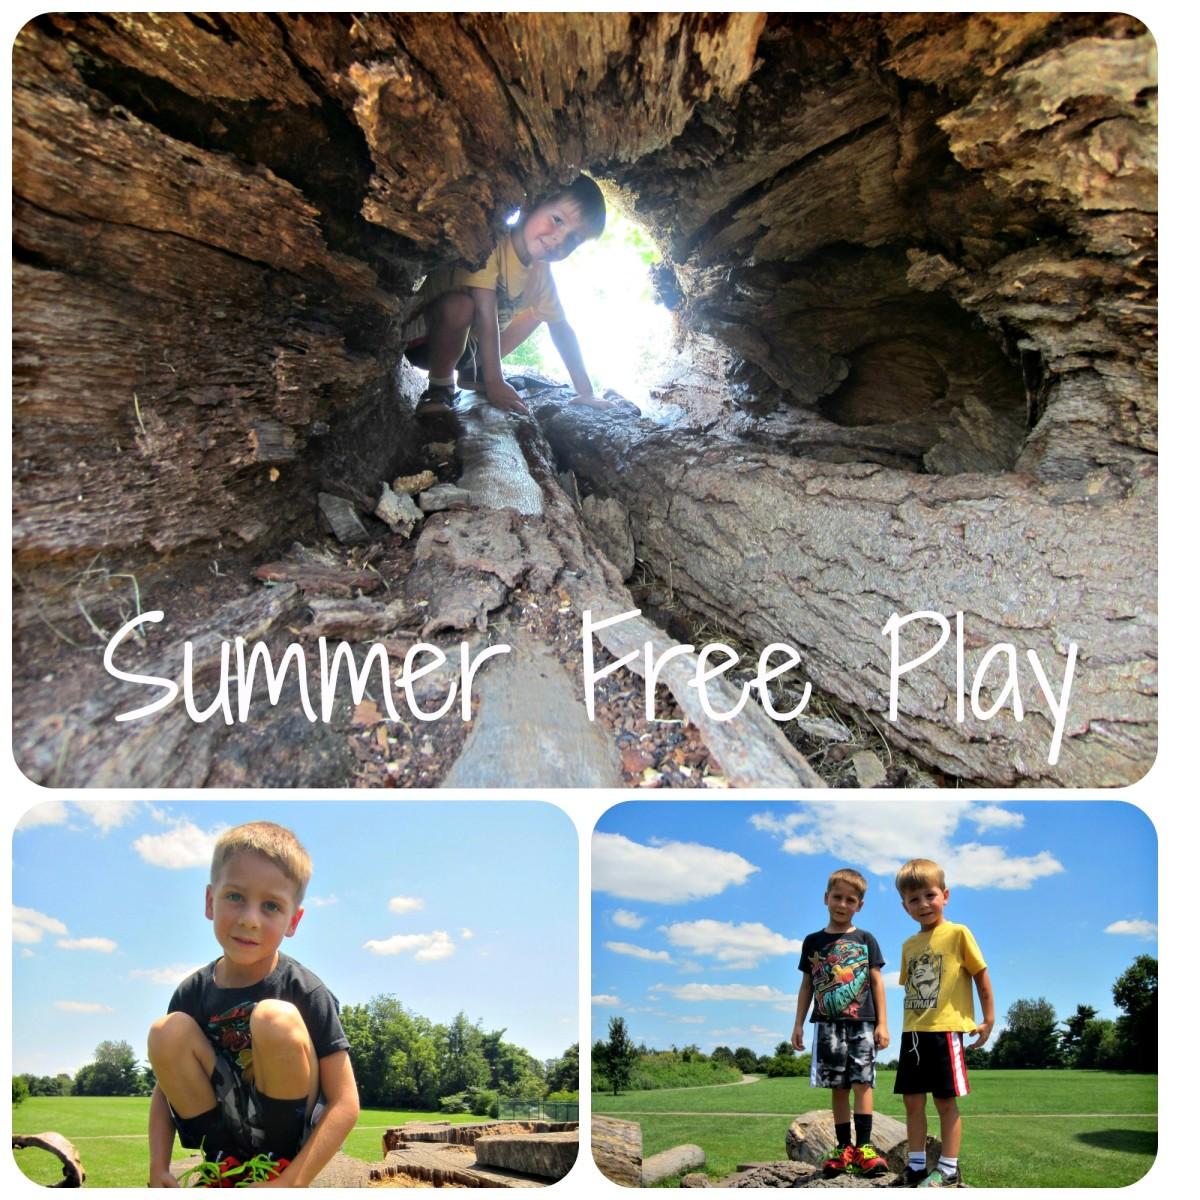 Free Tree Play